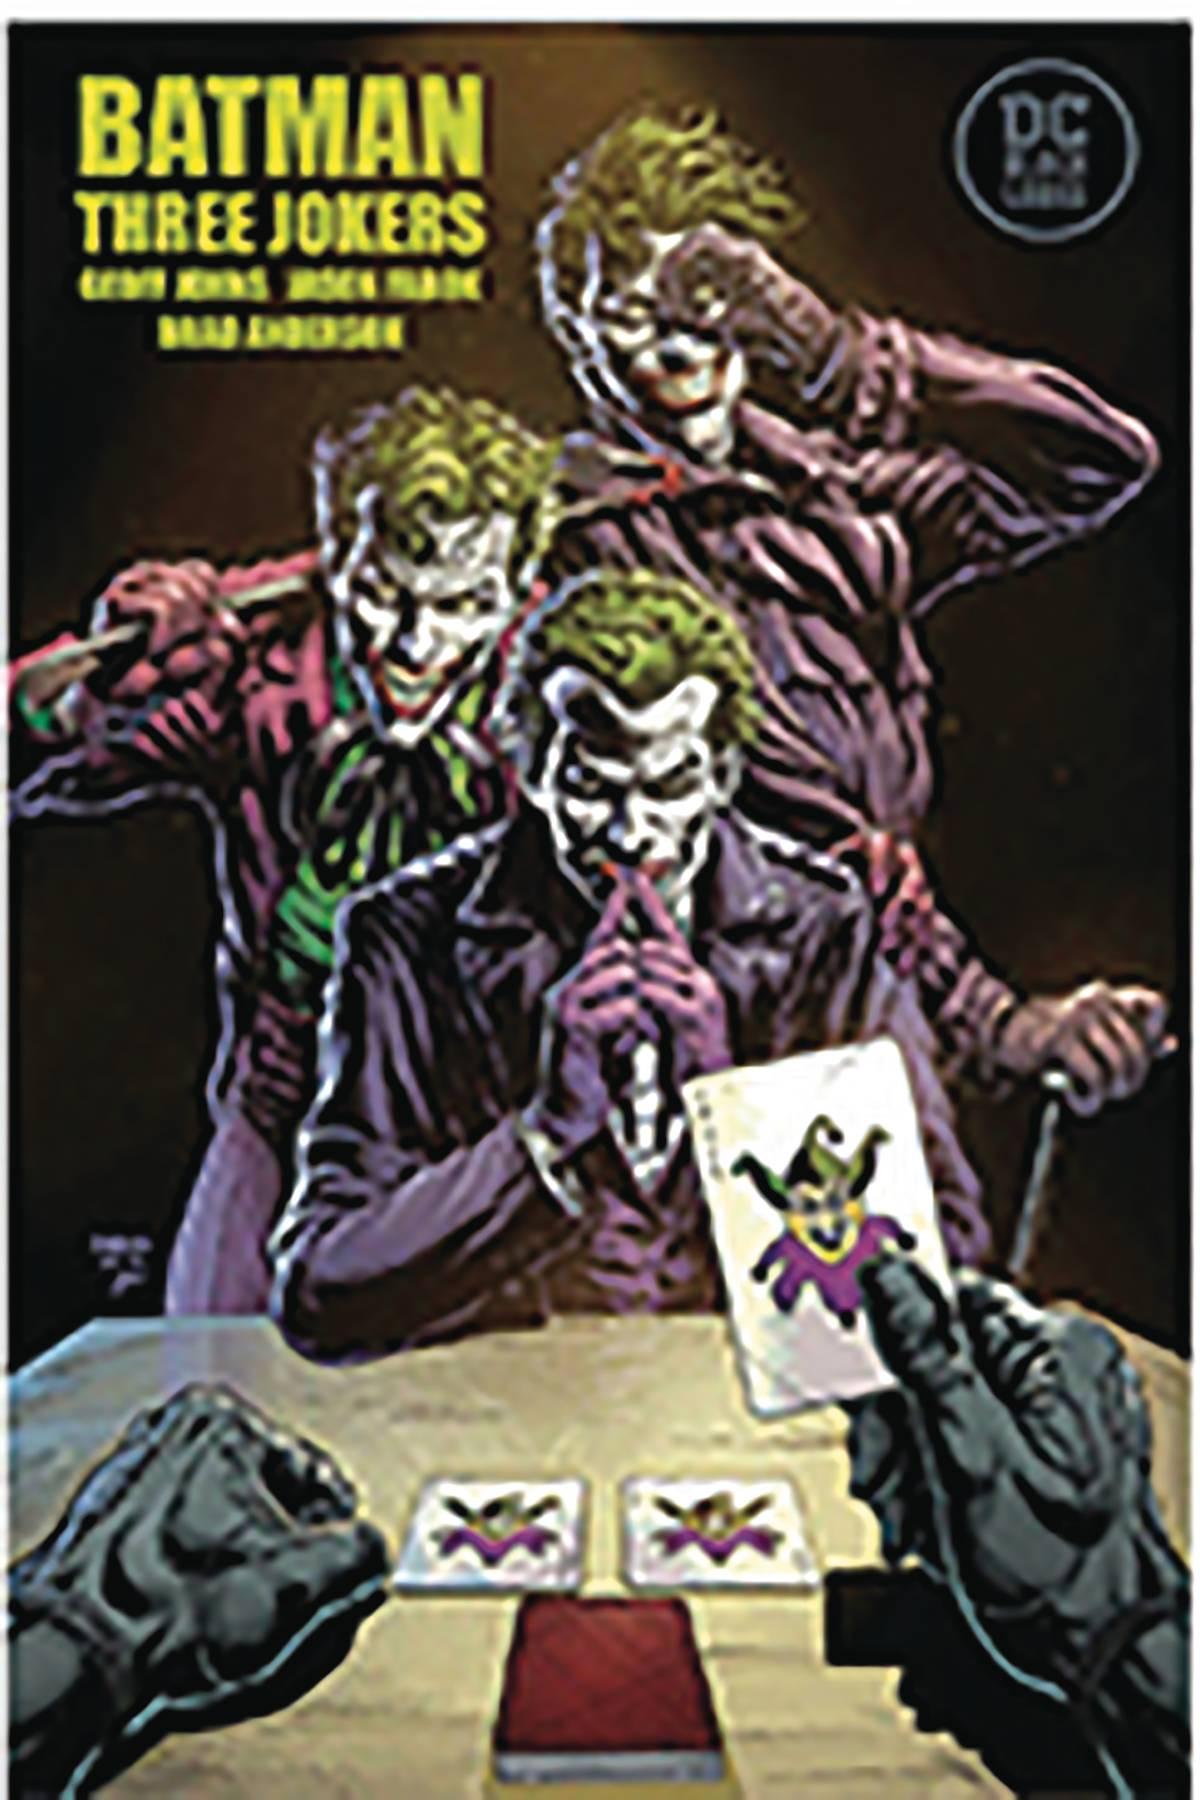 BATMAN THREE JOKERS #1 CGC GRADED